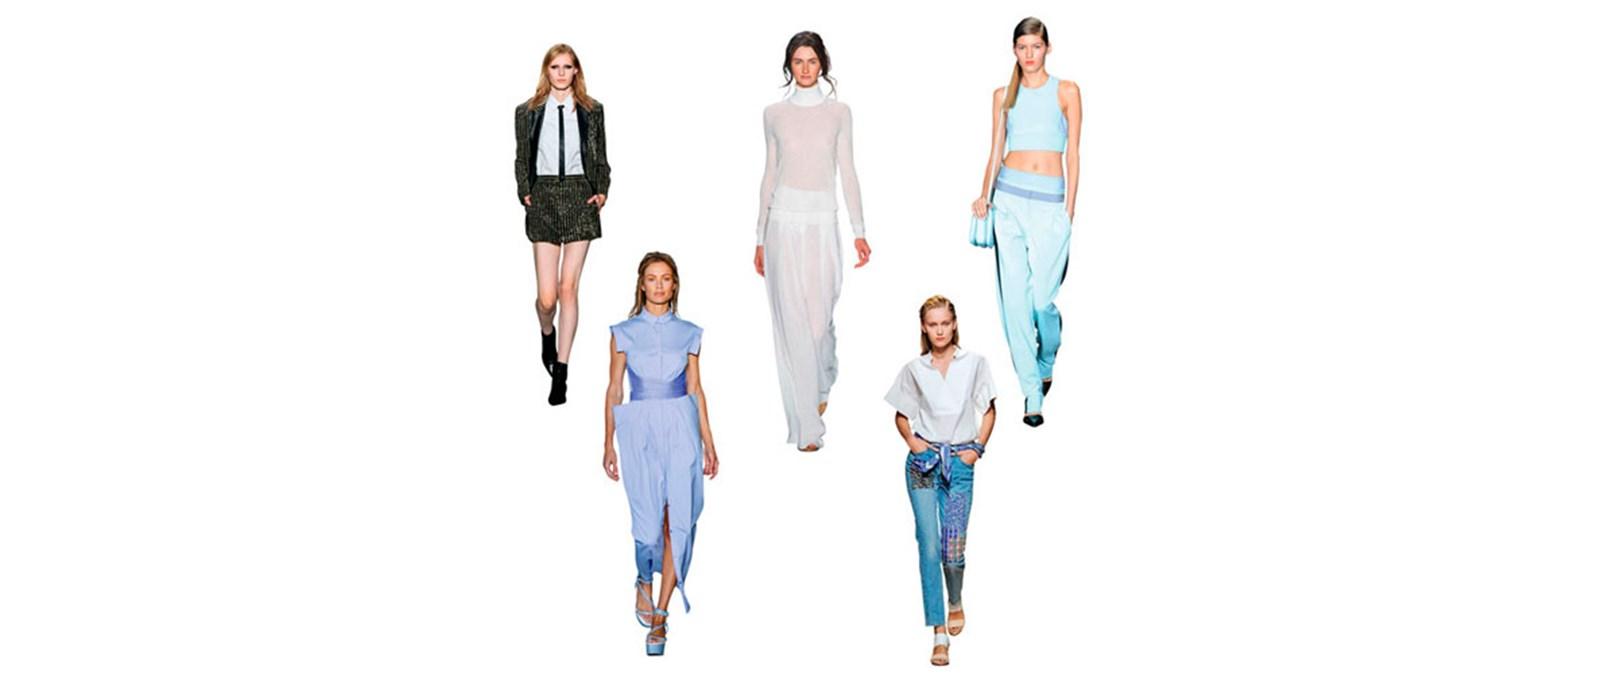 51190bd0465a Fashion Preview: Τα κομμάτια – κλειδιά της ανοιξιάτικης γκαρνταρόμπας